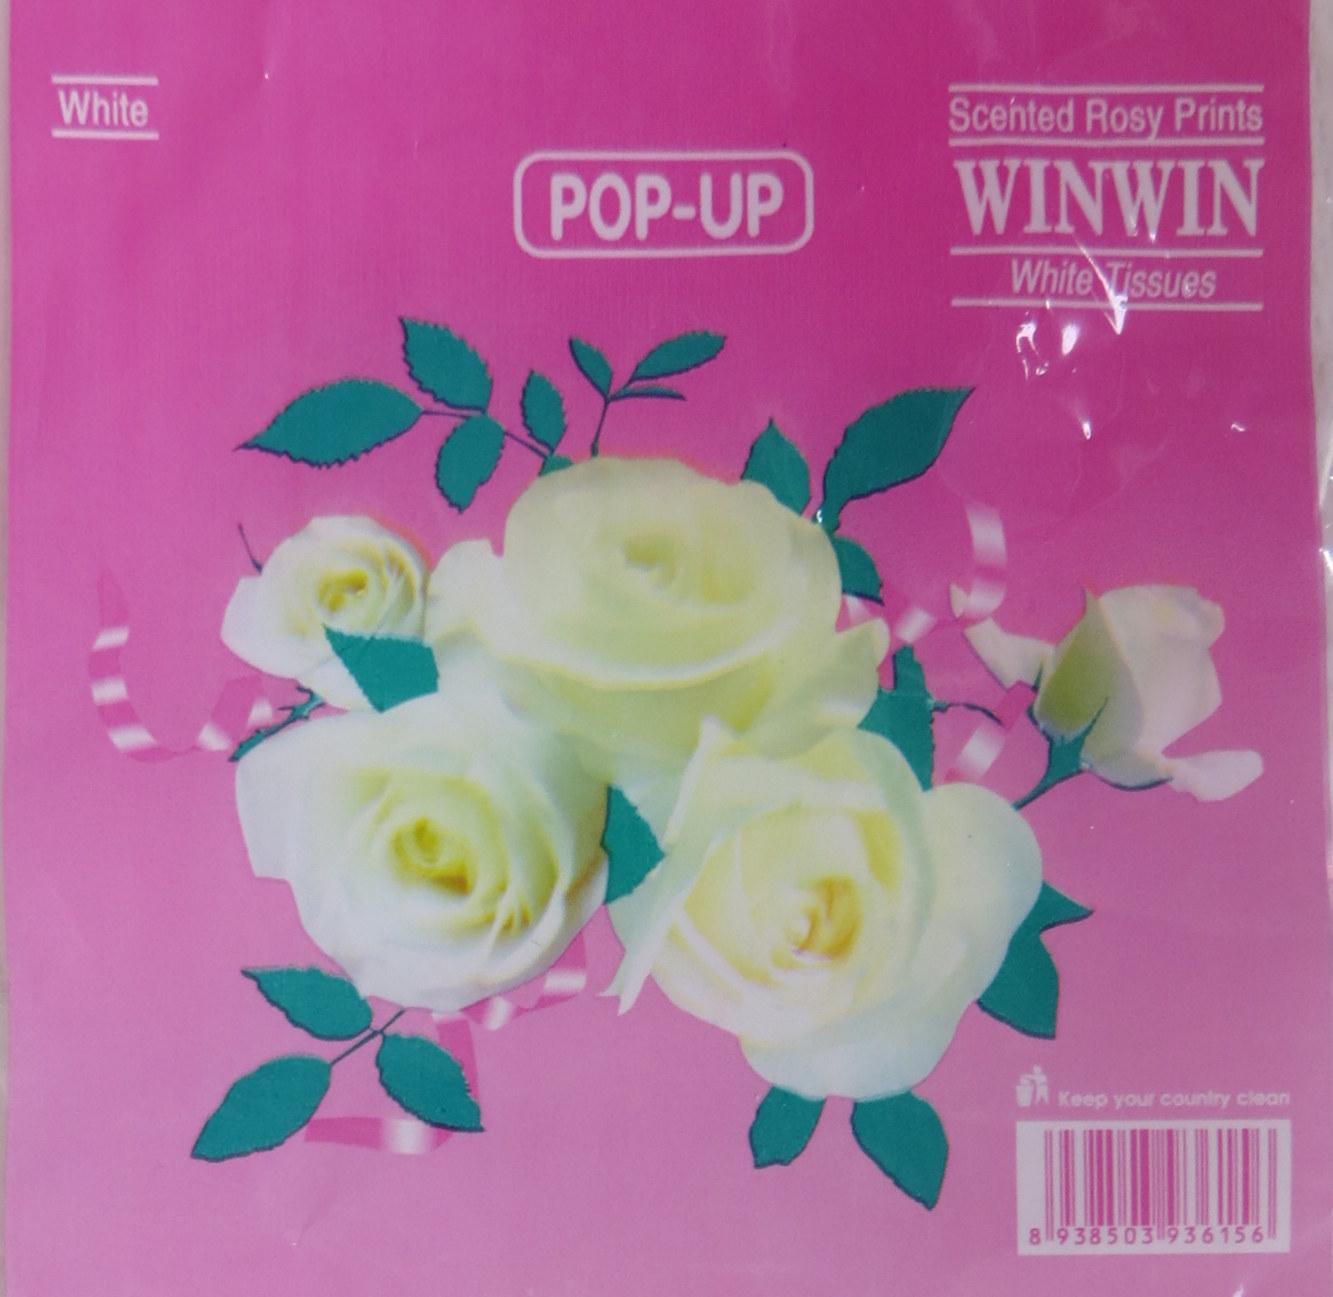 Khăn Pop-up Winwin Hồng